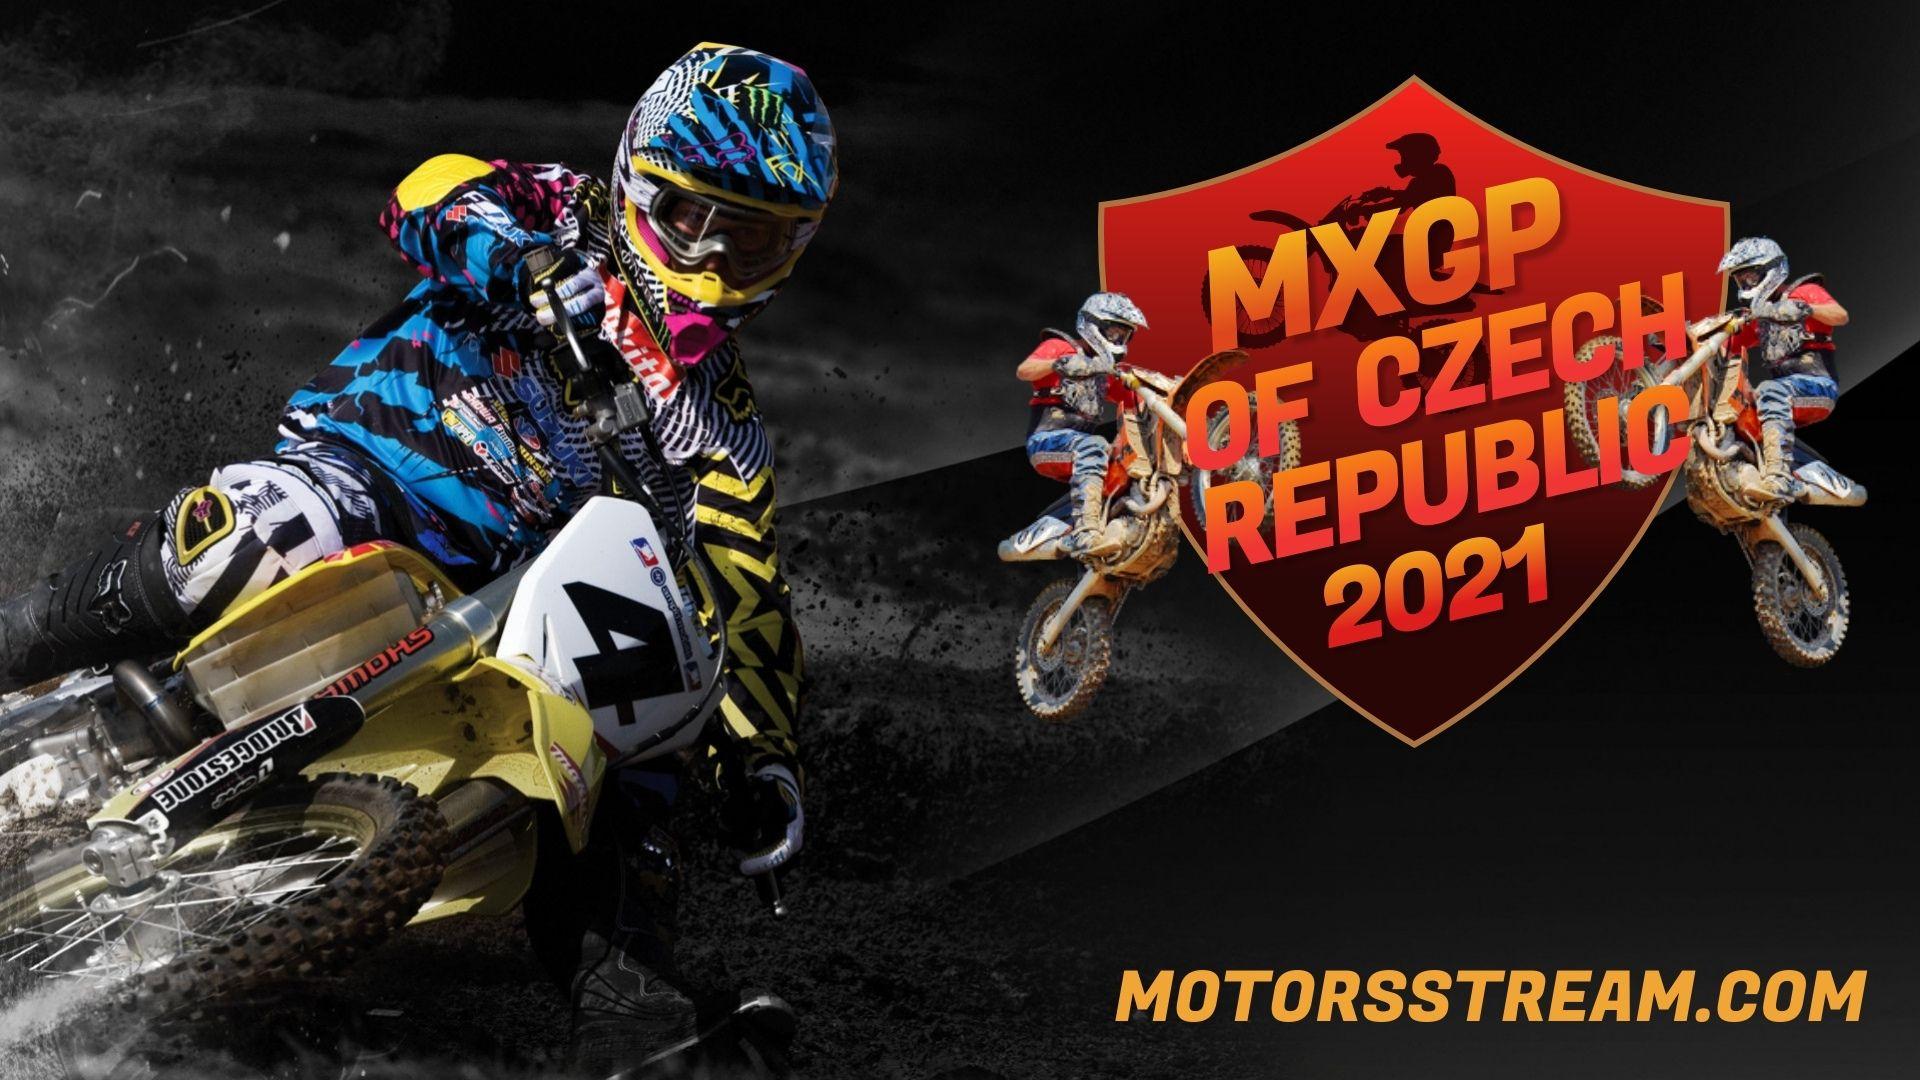 FIM Motocross WC Czech Republic Live Stream 2021 | MXGP